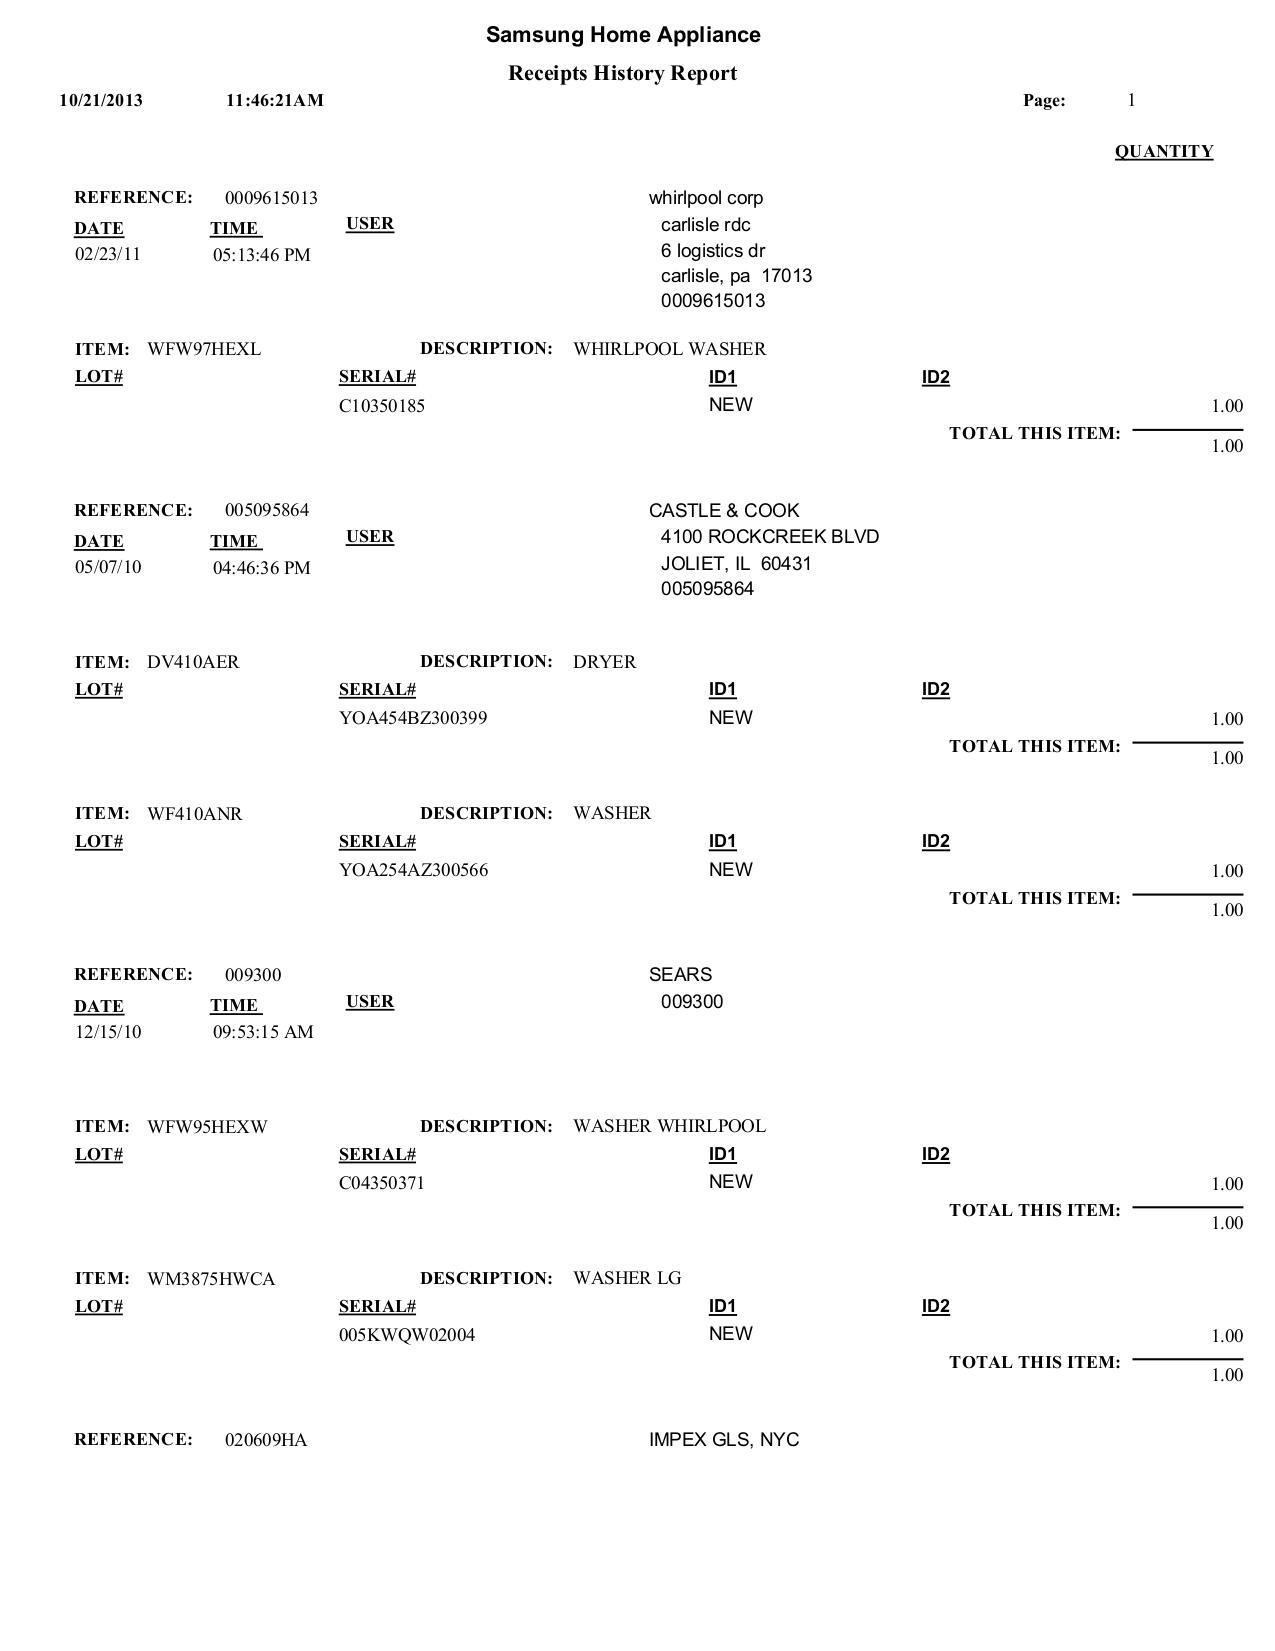 pdf for Samsung Refrigerator RB217ABPN manual